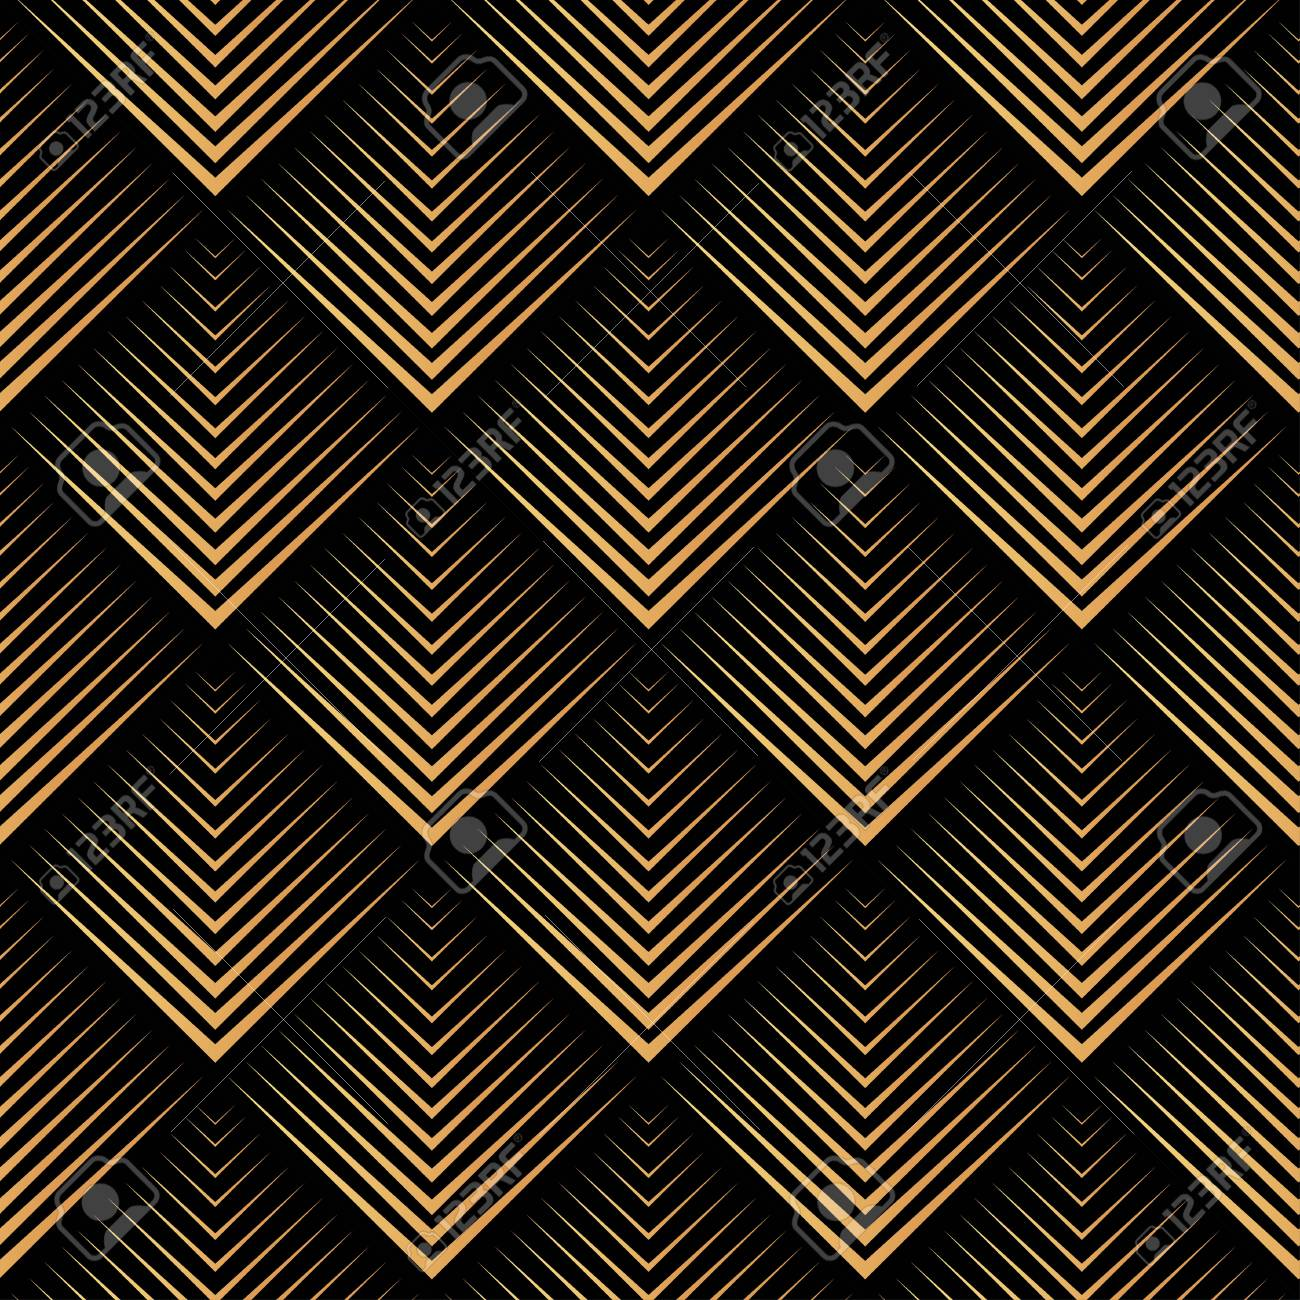 Art Deco, geometric, vector seamless pattern - gold on black - 107876015